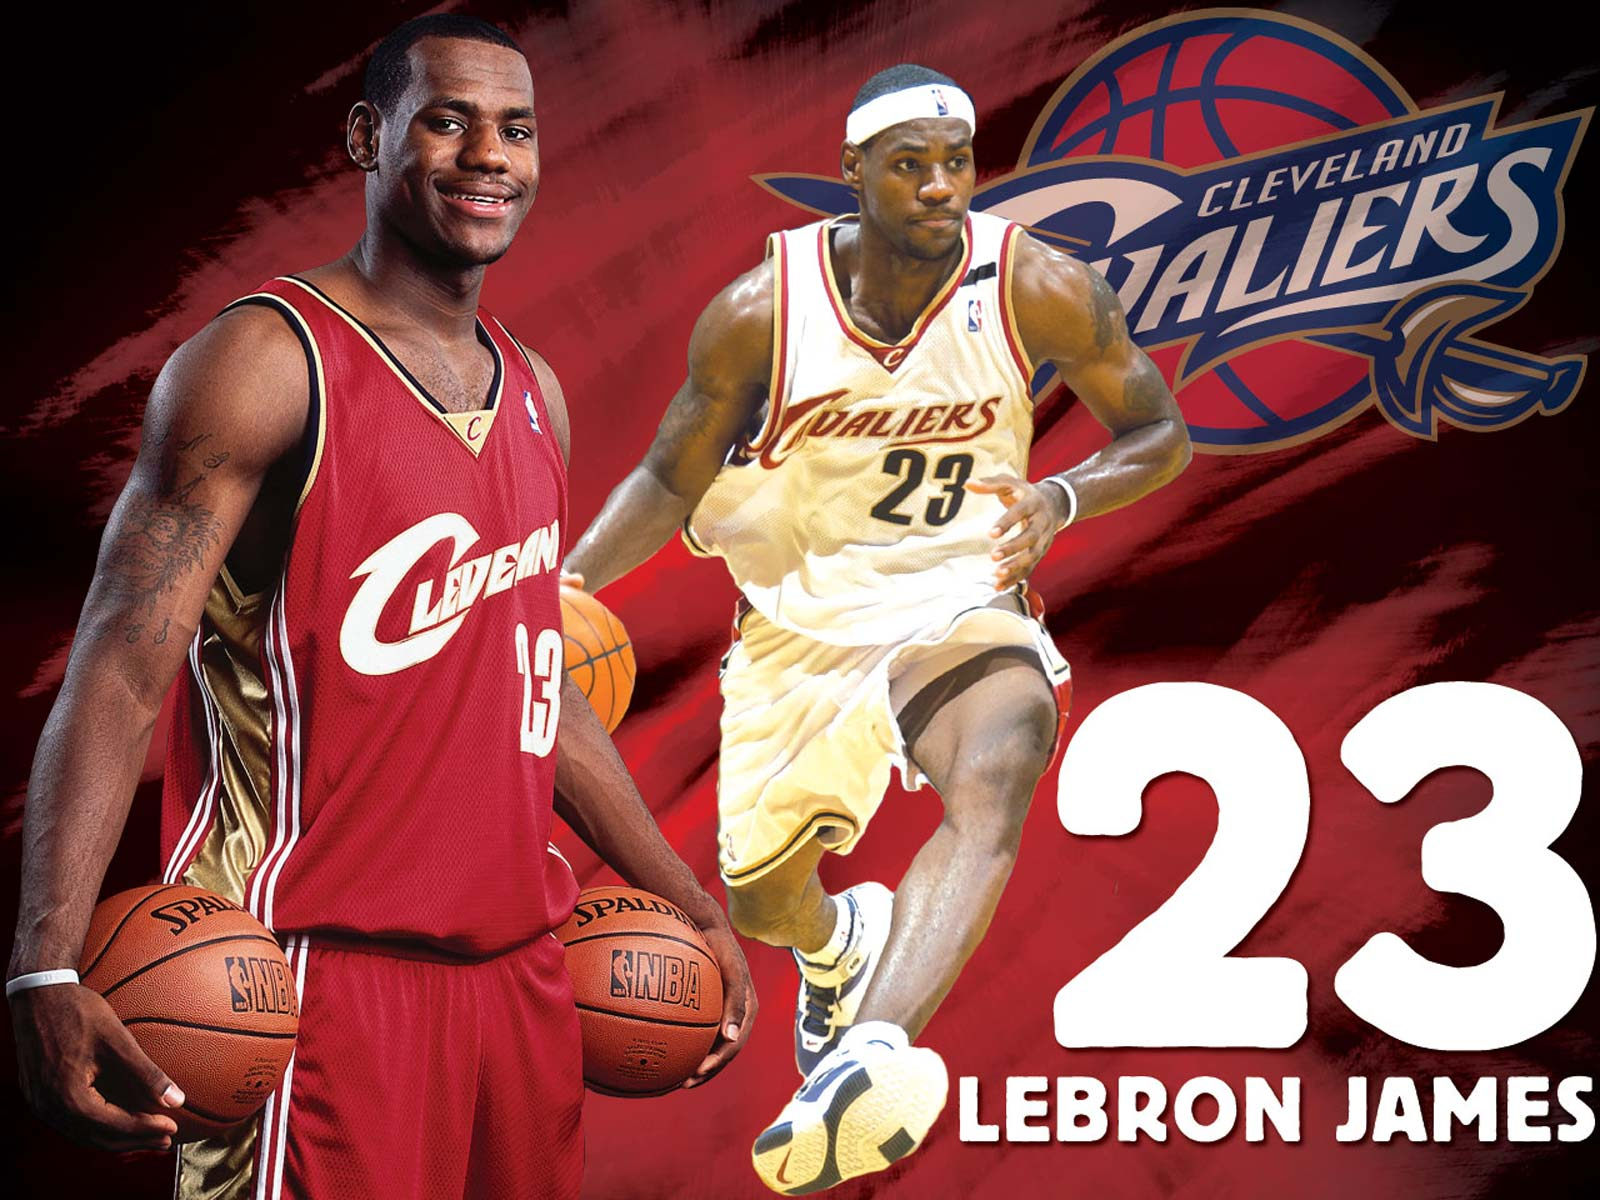 LeBron James Cavaliers Wallpaper